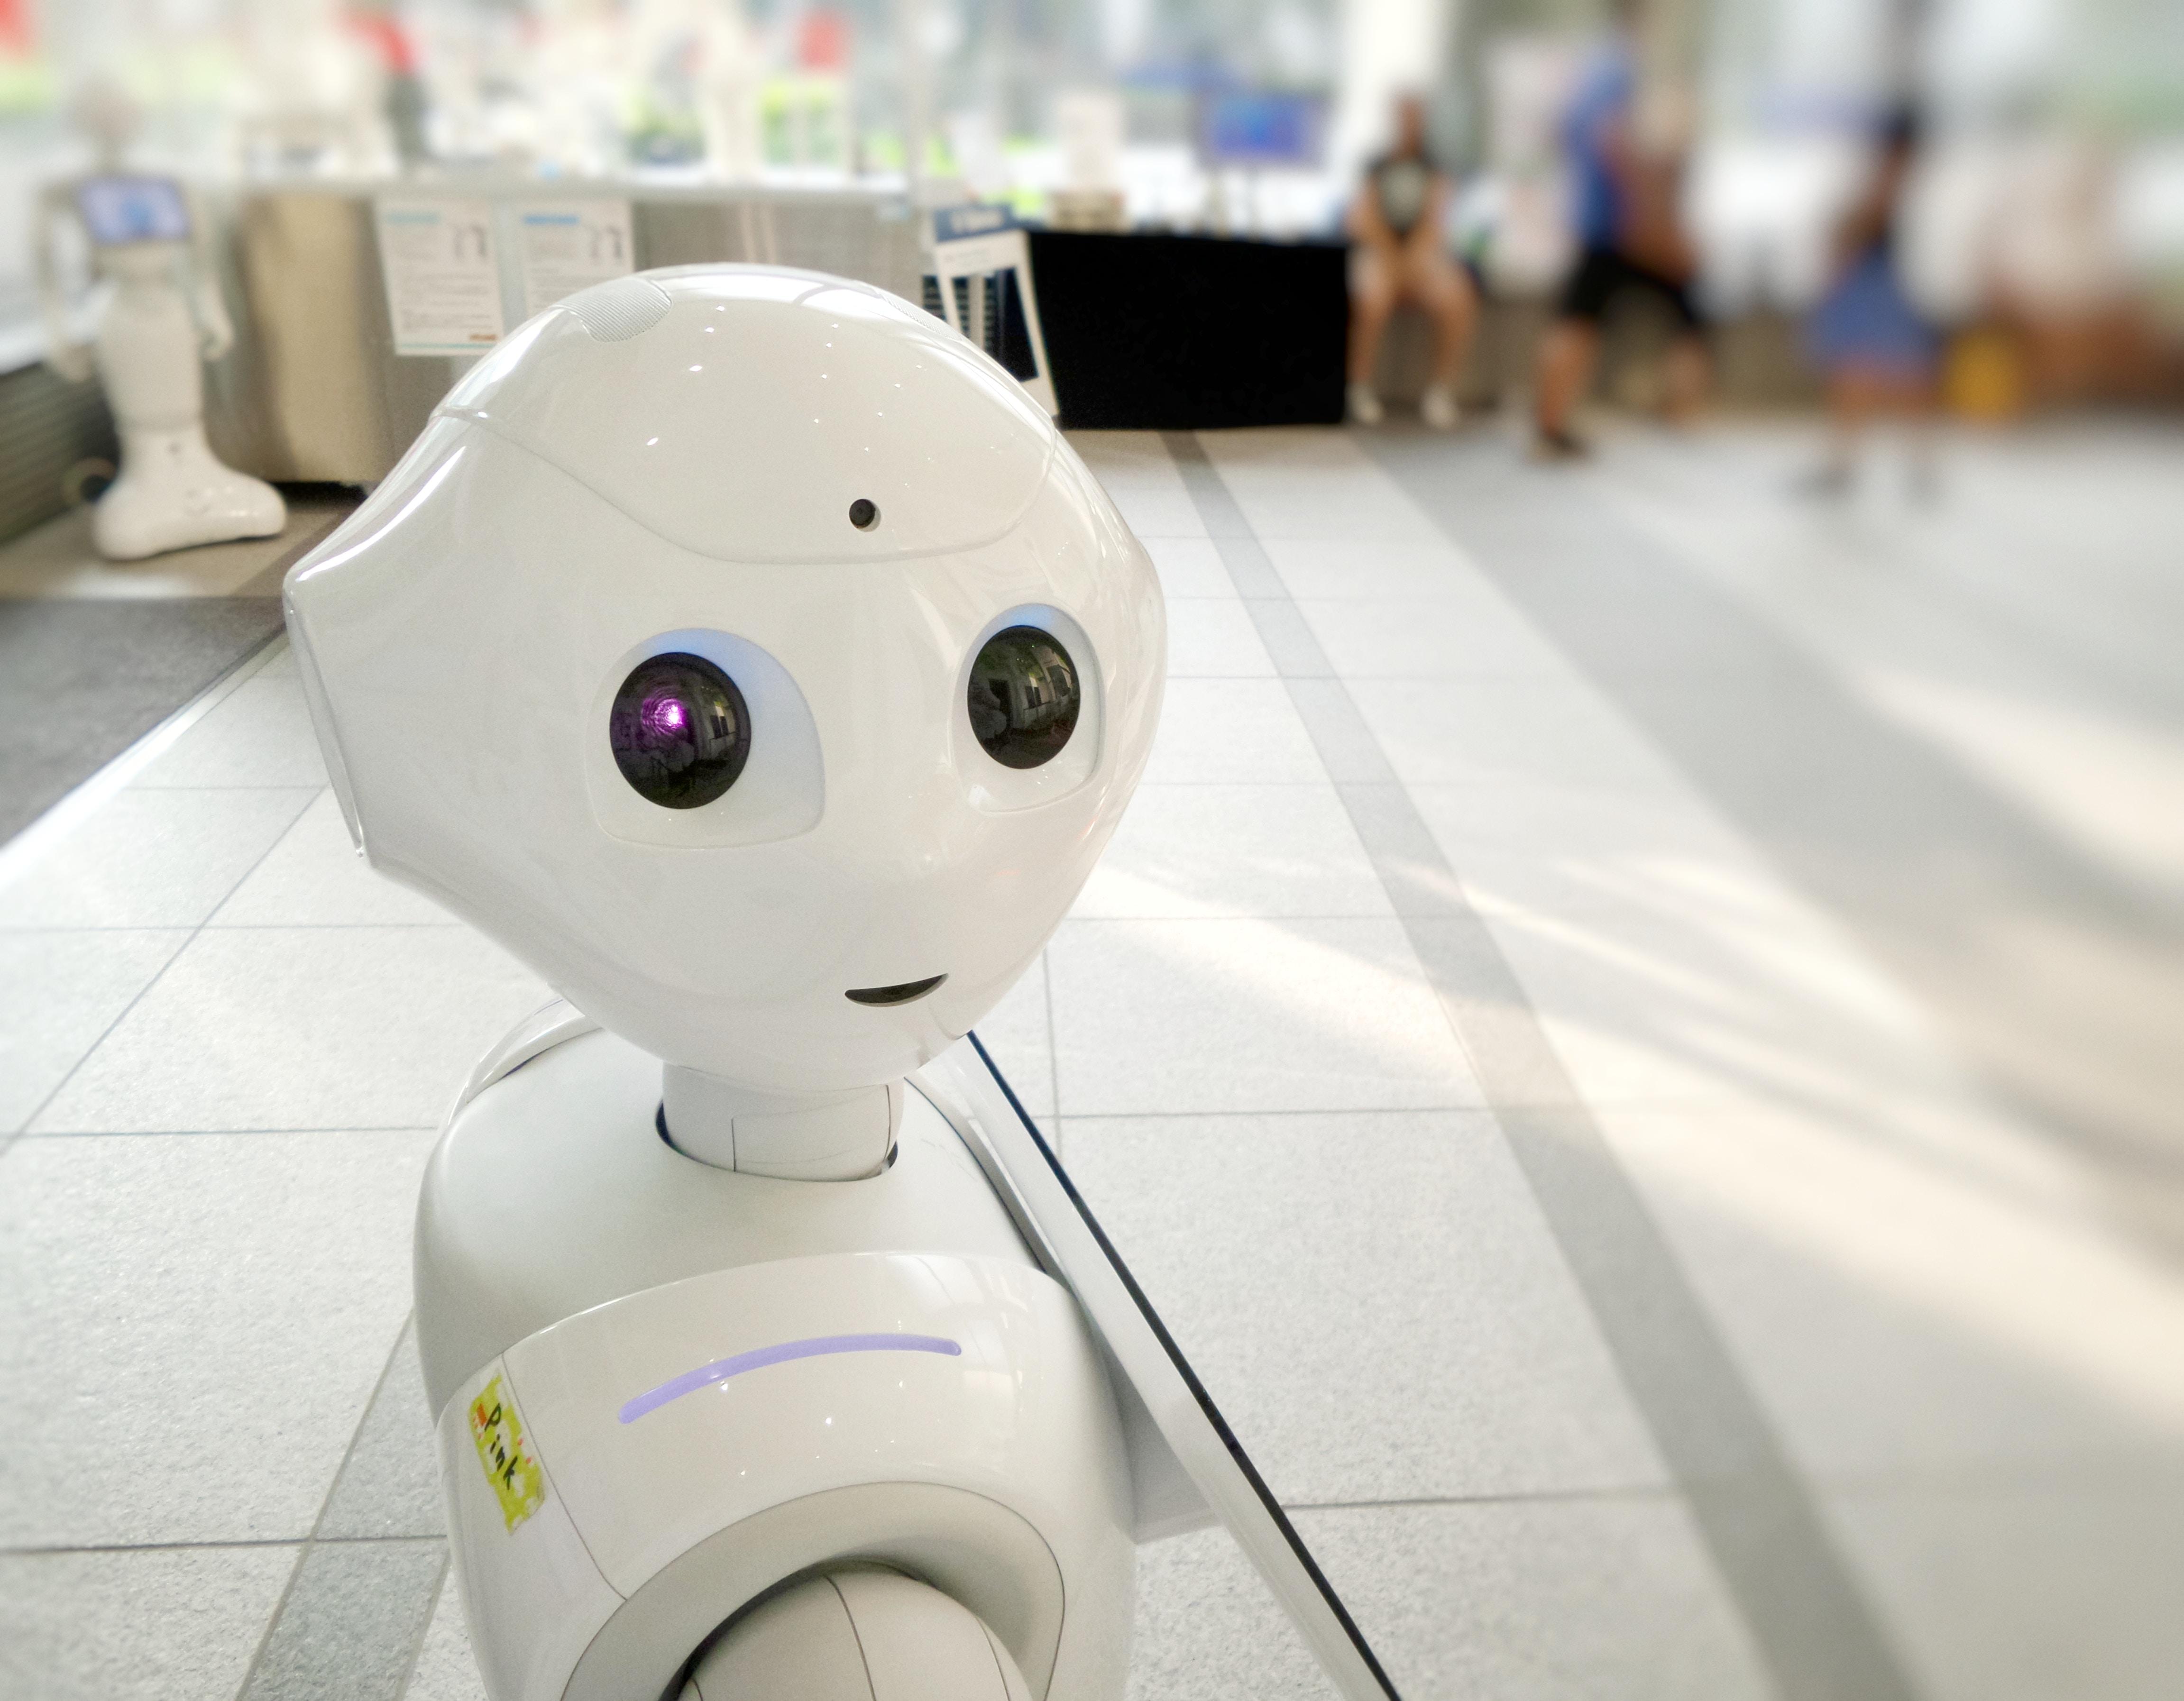 l'IA personnalisation